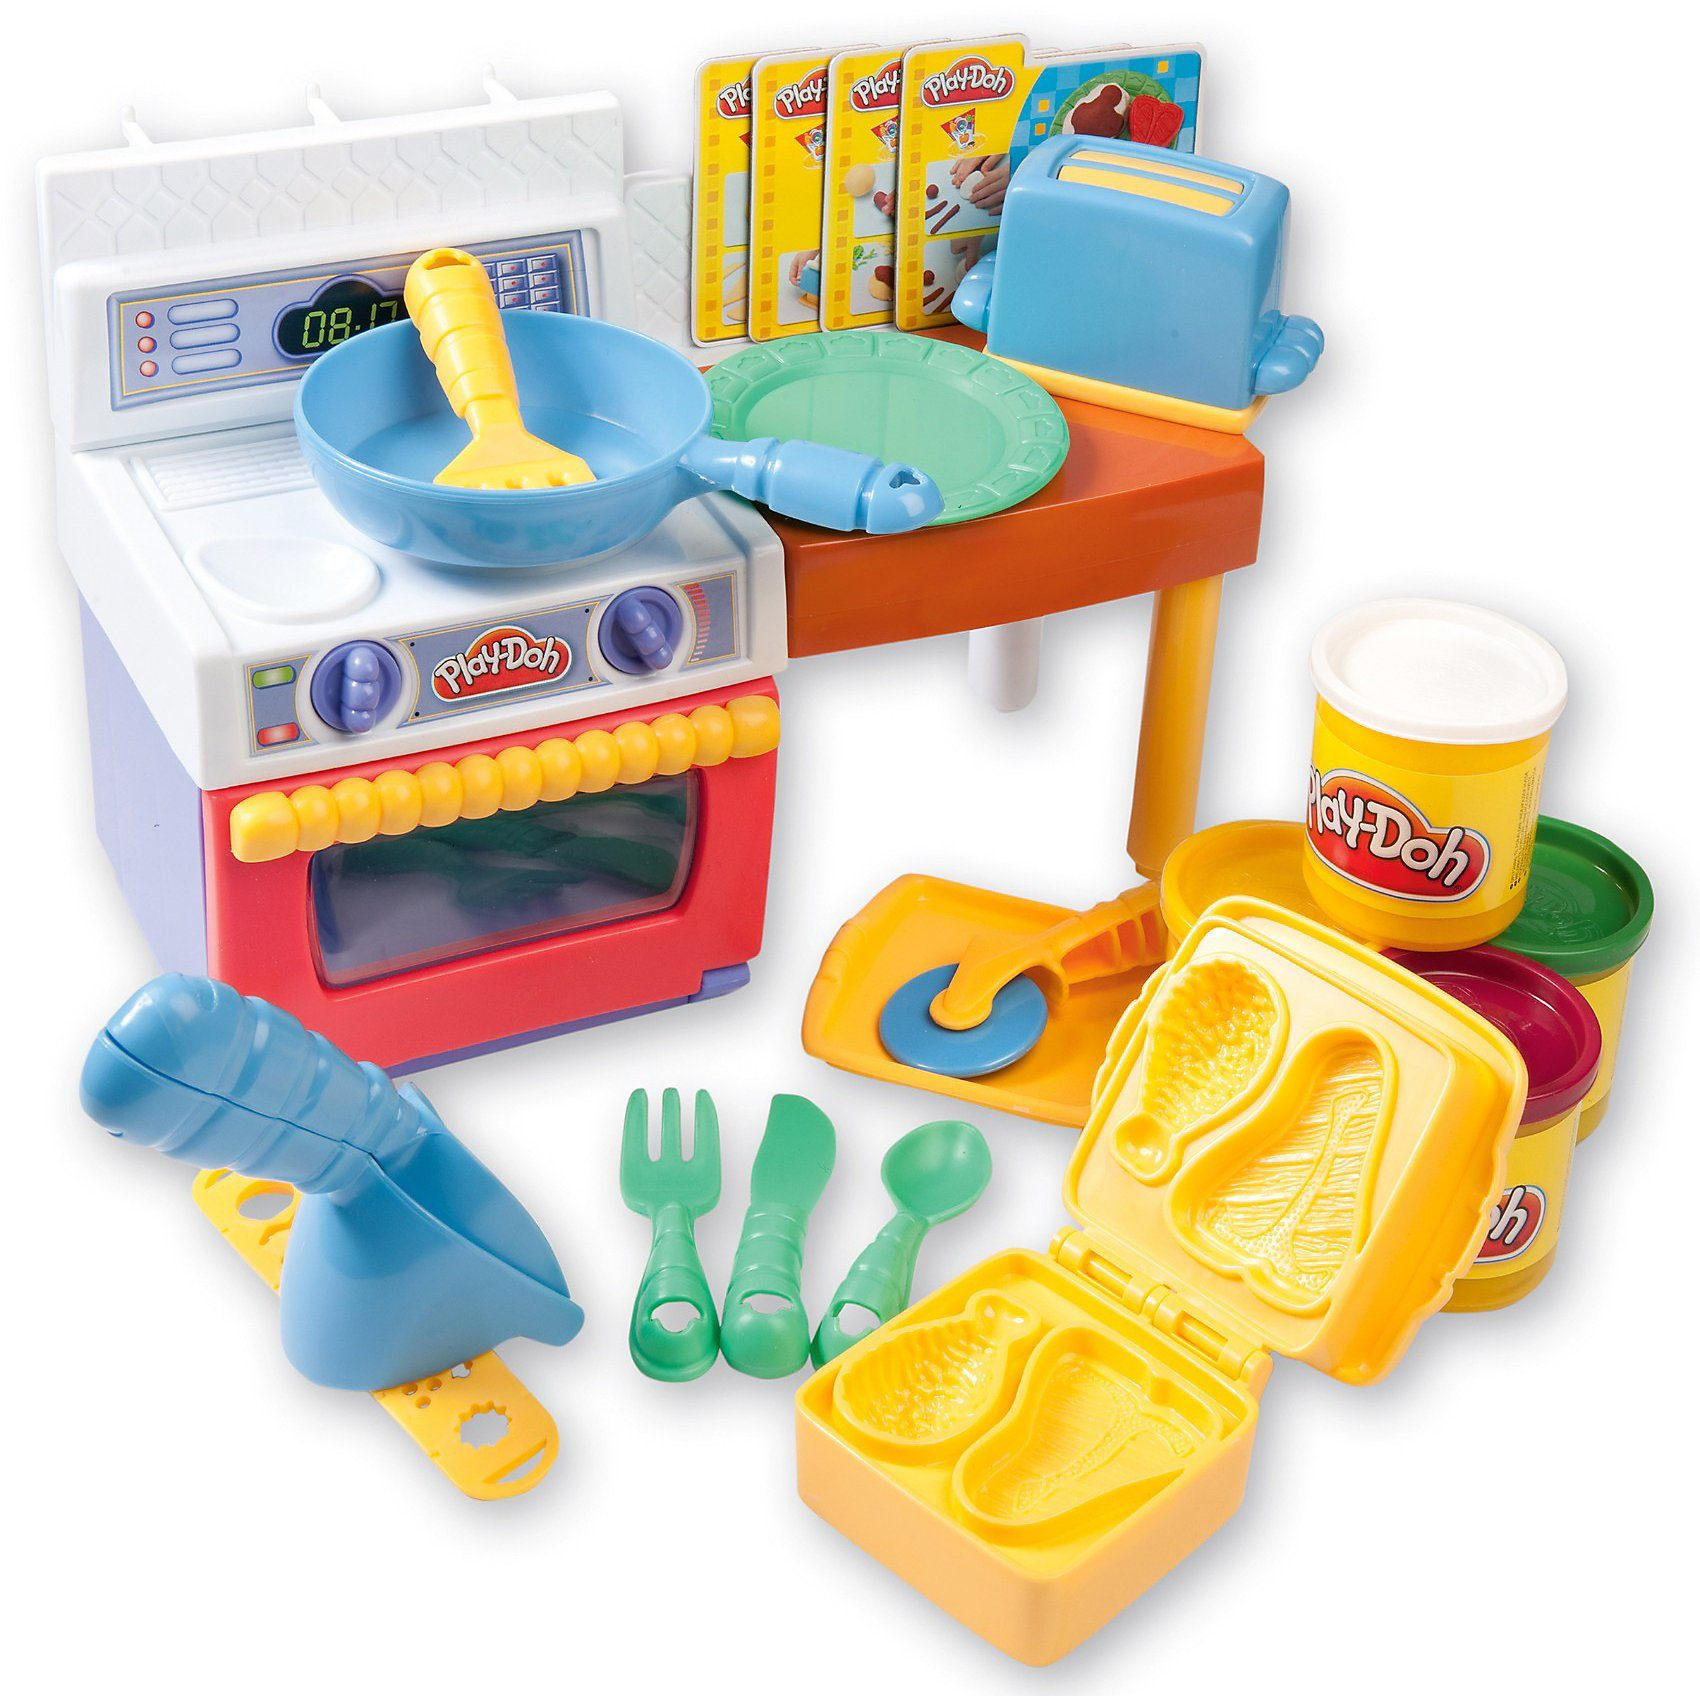 Hasbro Play-Doh- Knetküche